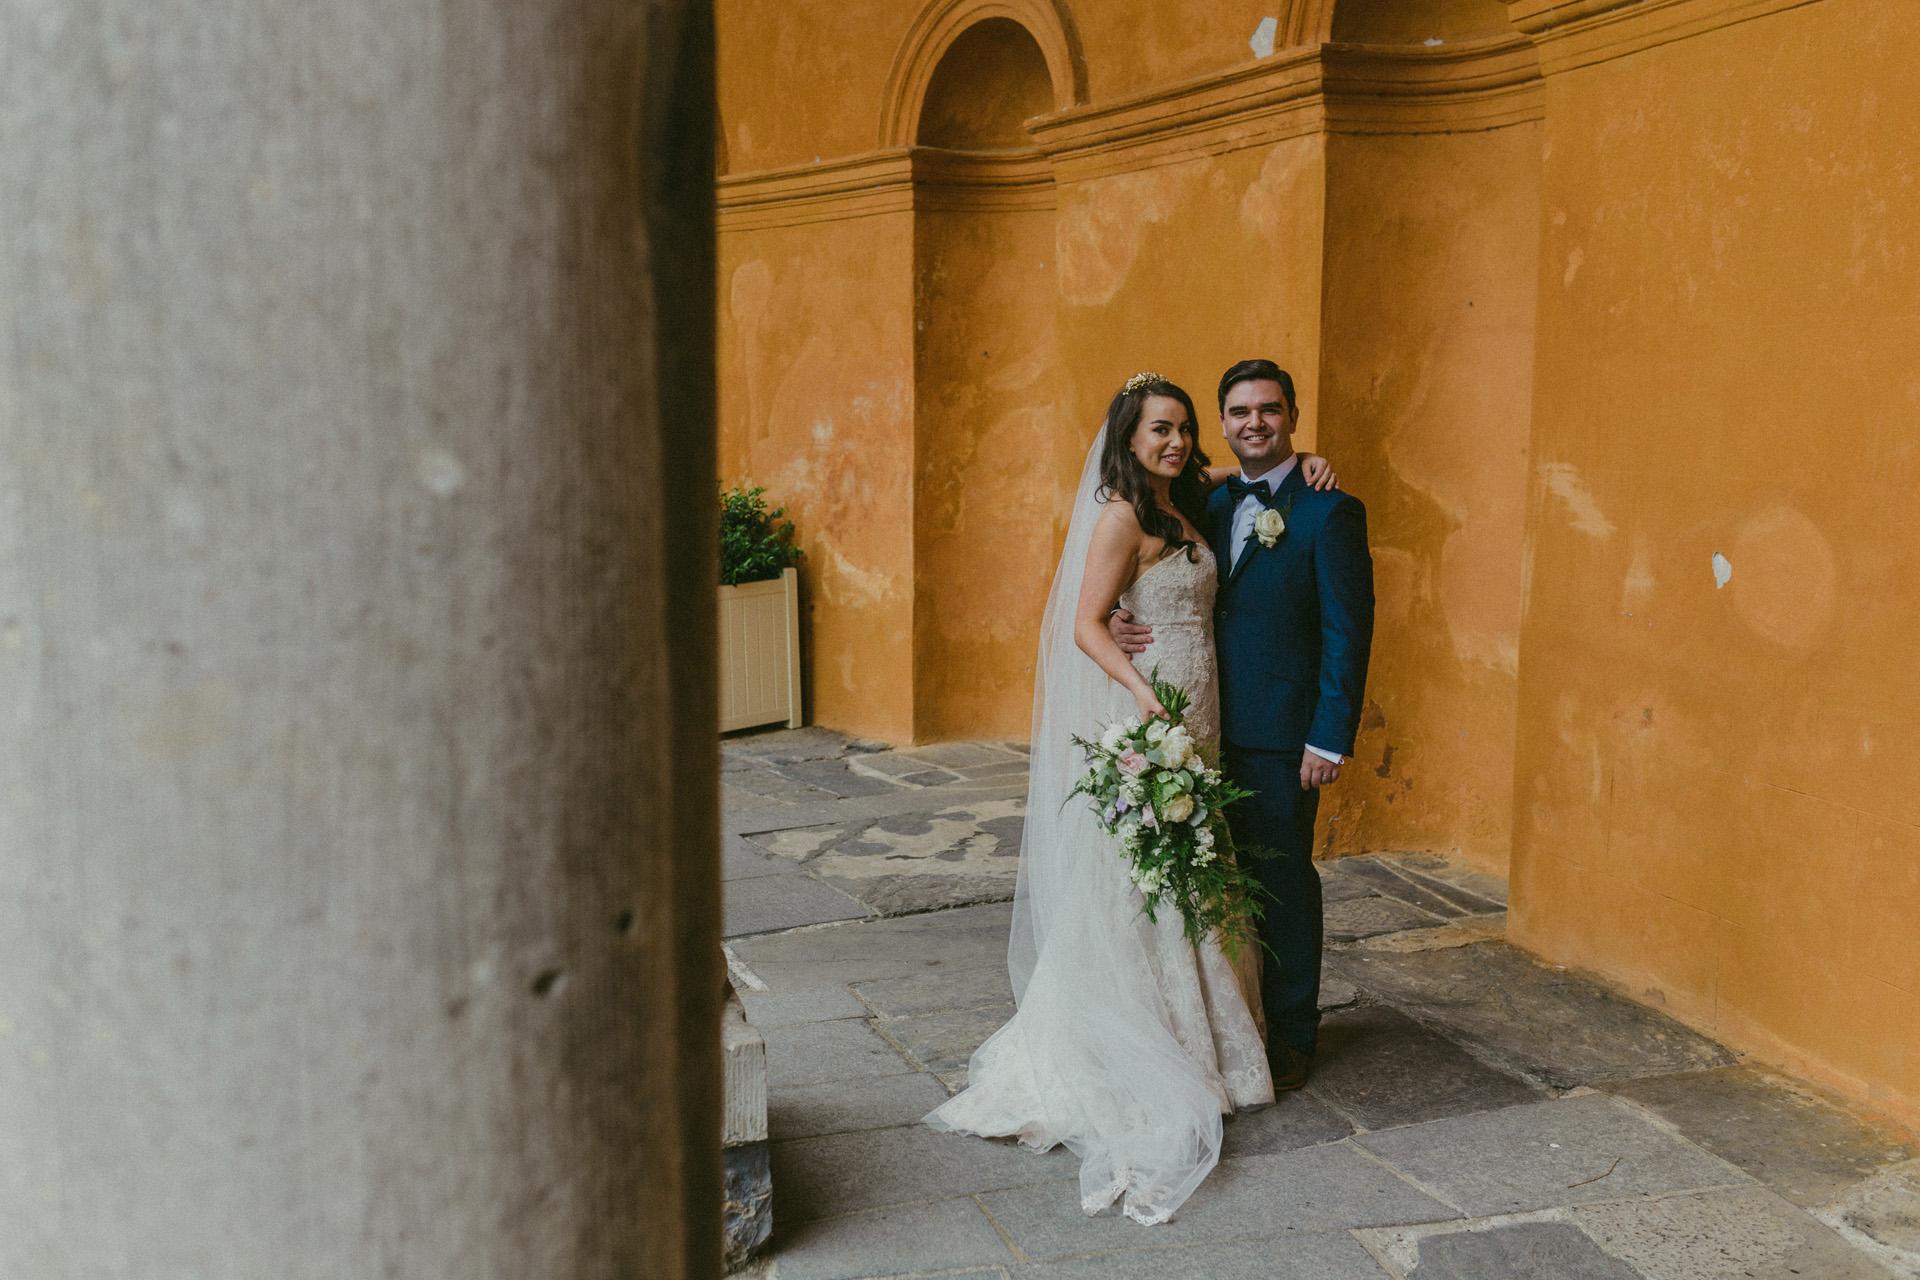 Celbridge Manor Weddings